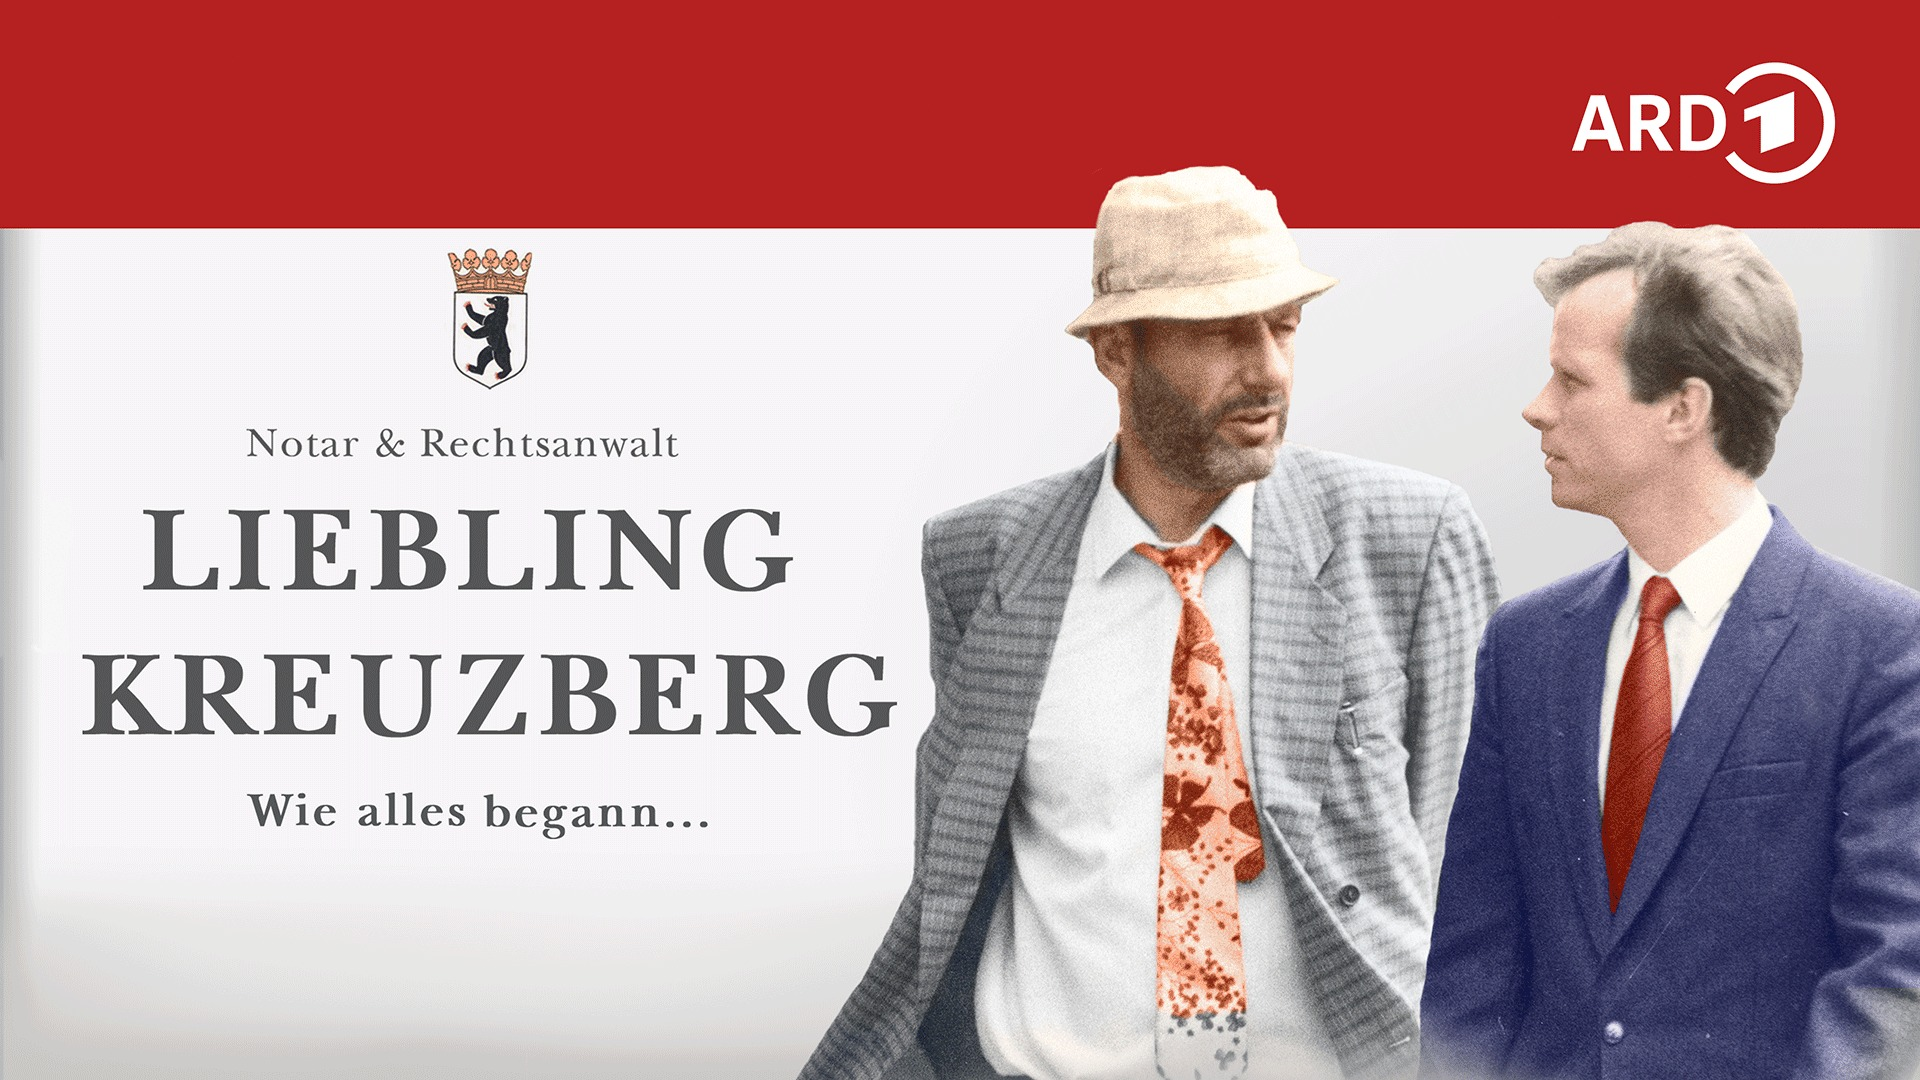 Liebling Kreuzberg, Staffel 1